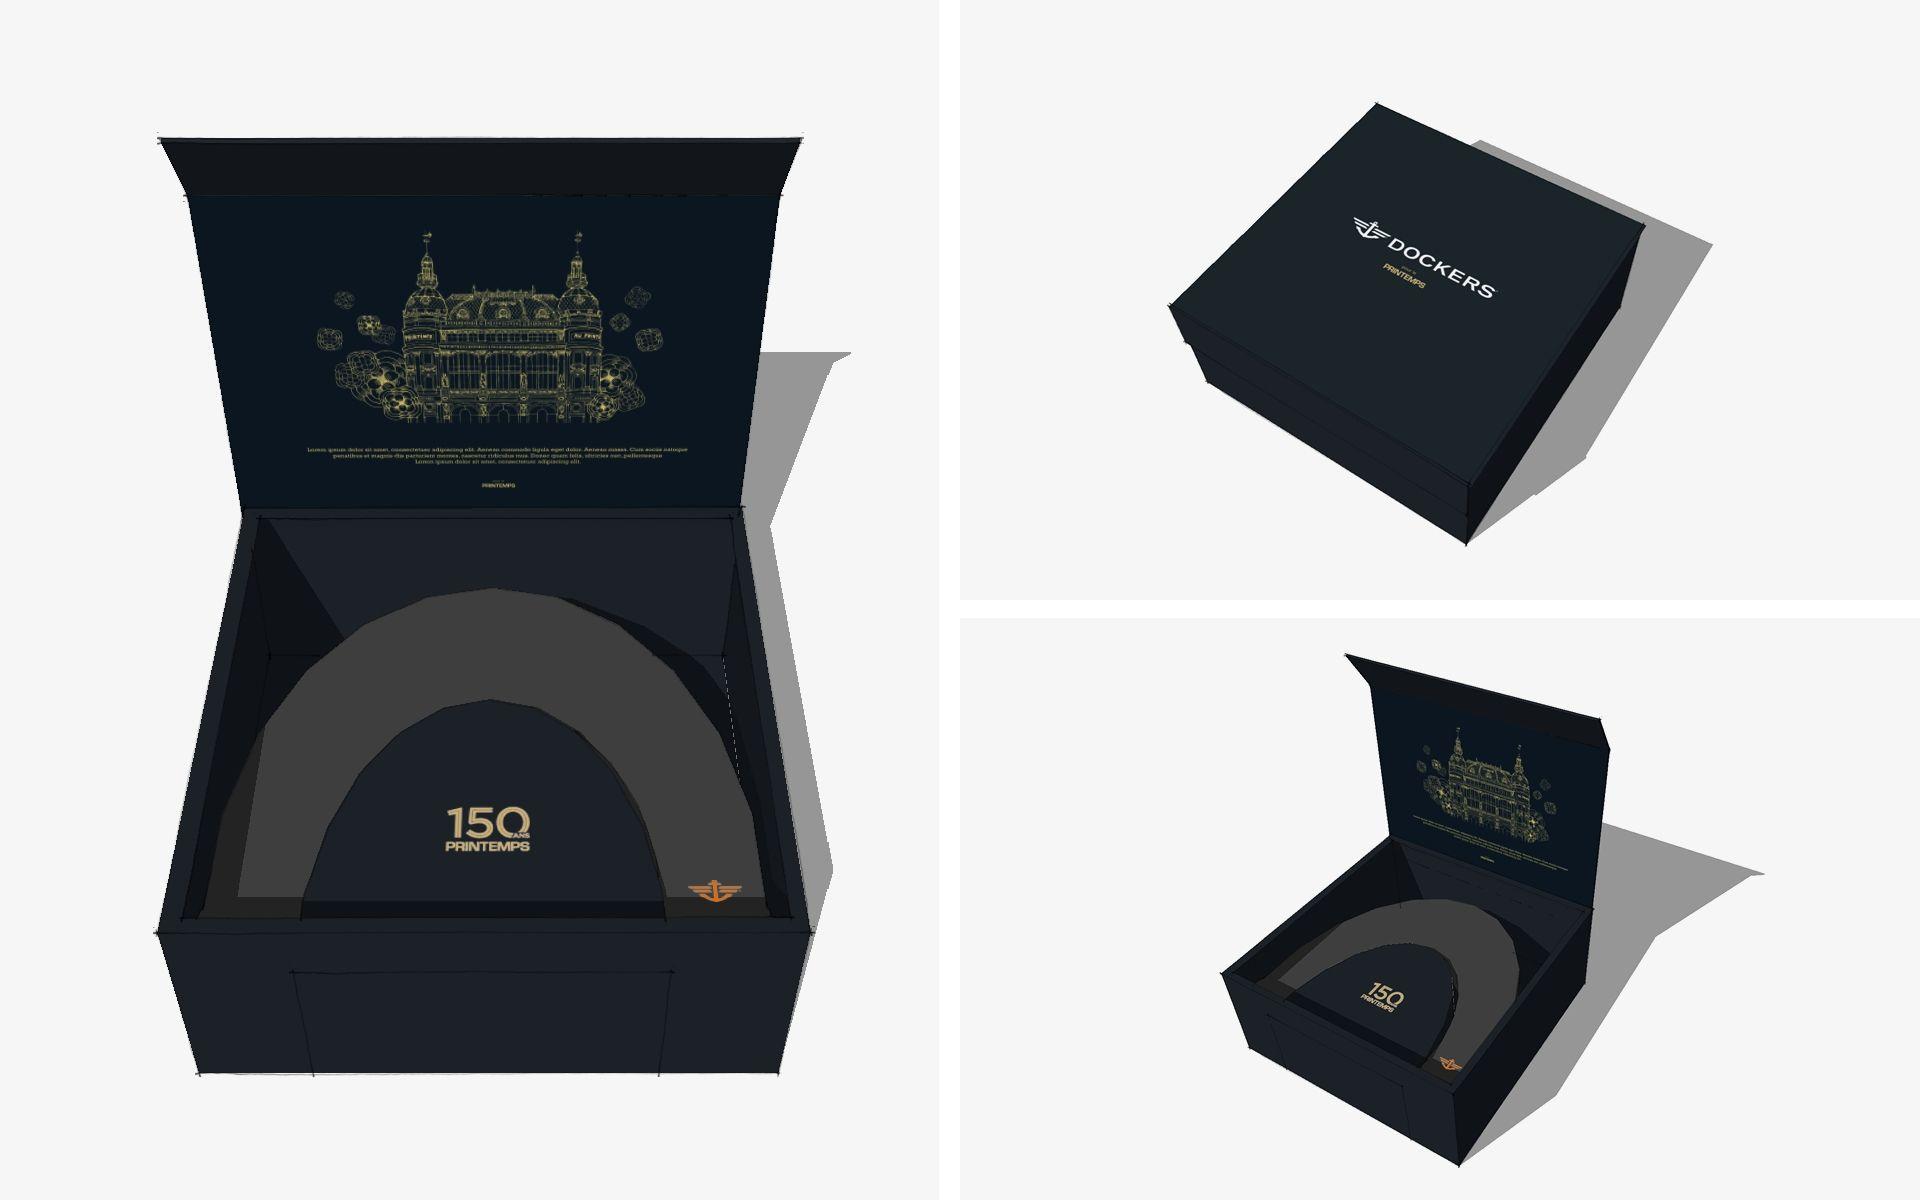 Special Pack X 150 Ans Printemps